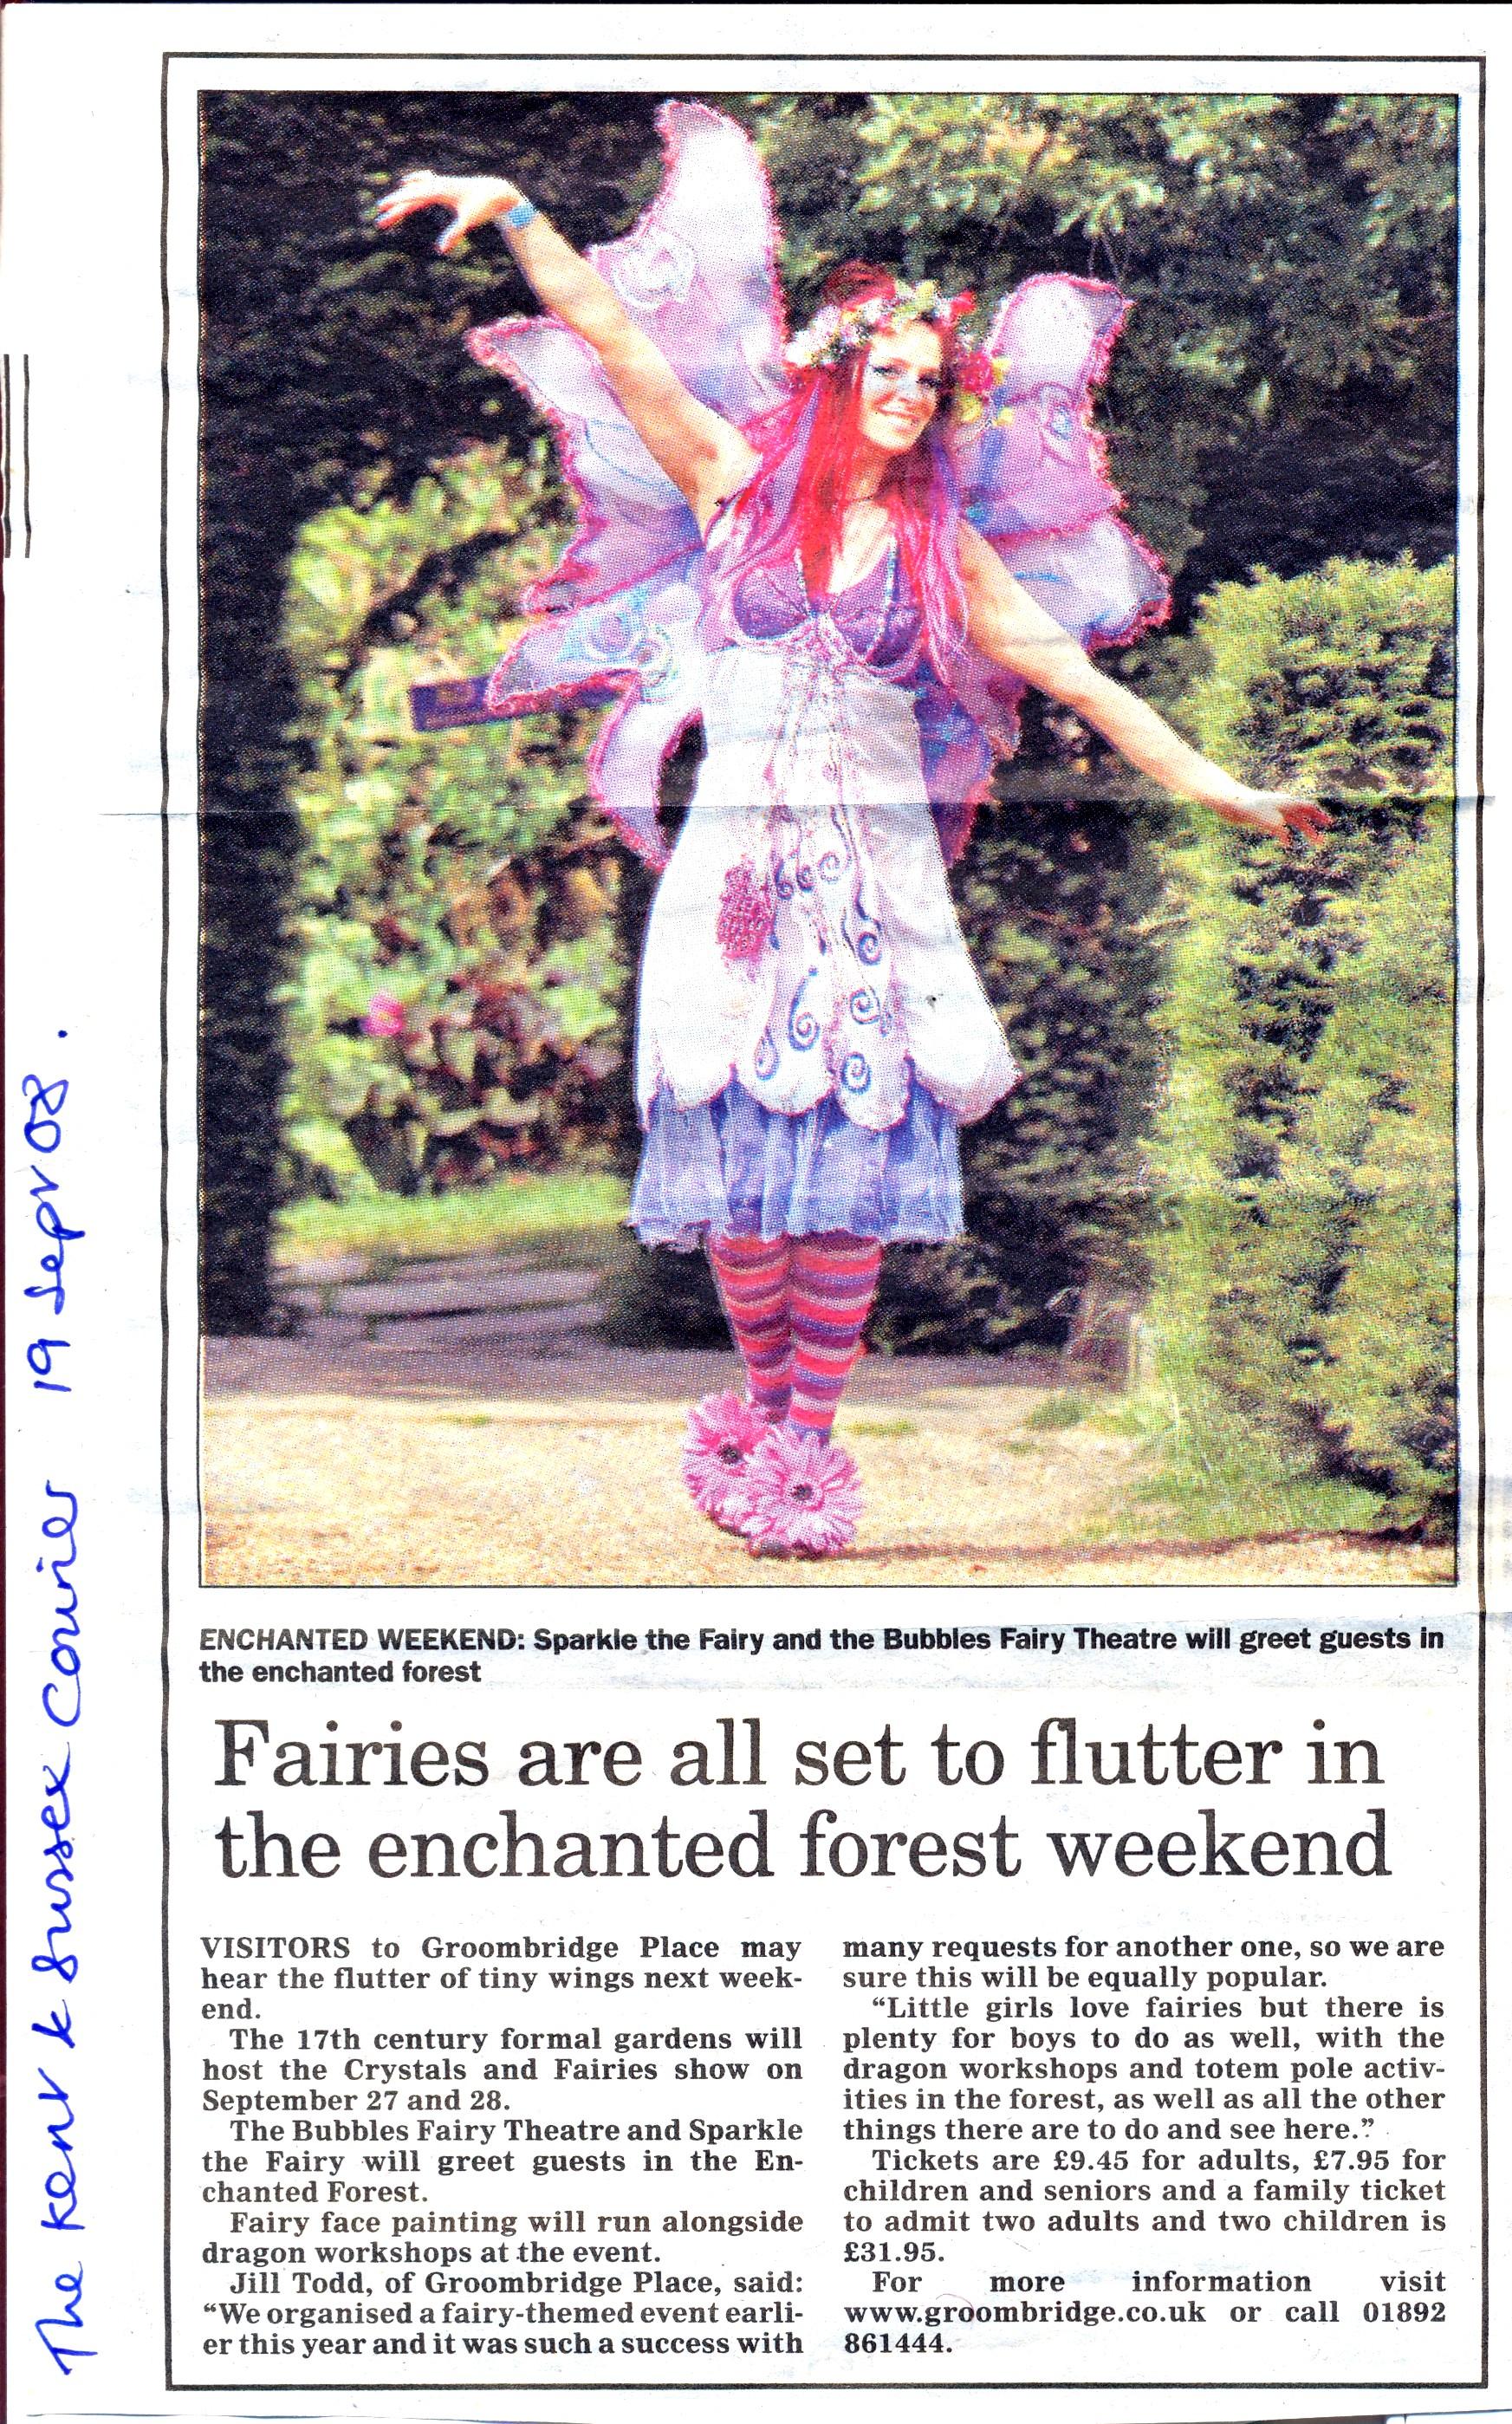 Felicity Fairy at Groombridge Place, Tunbridge Wells.